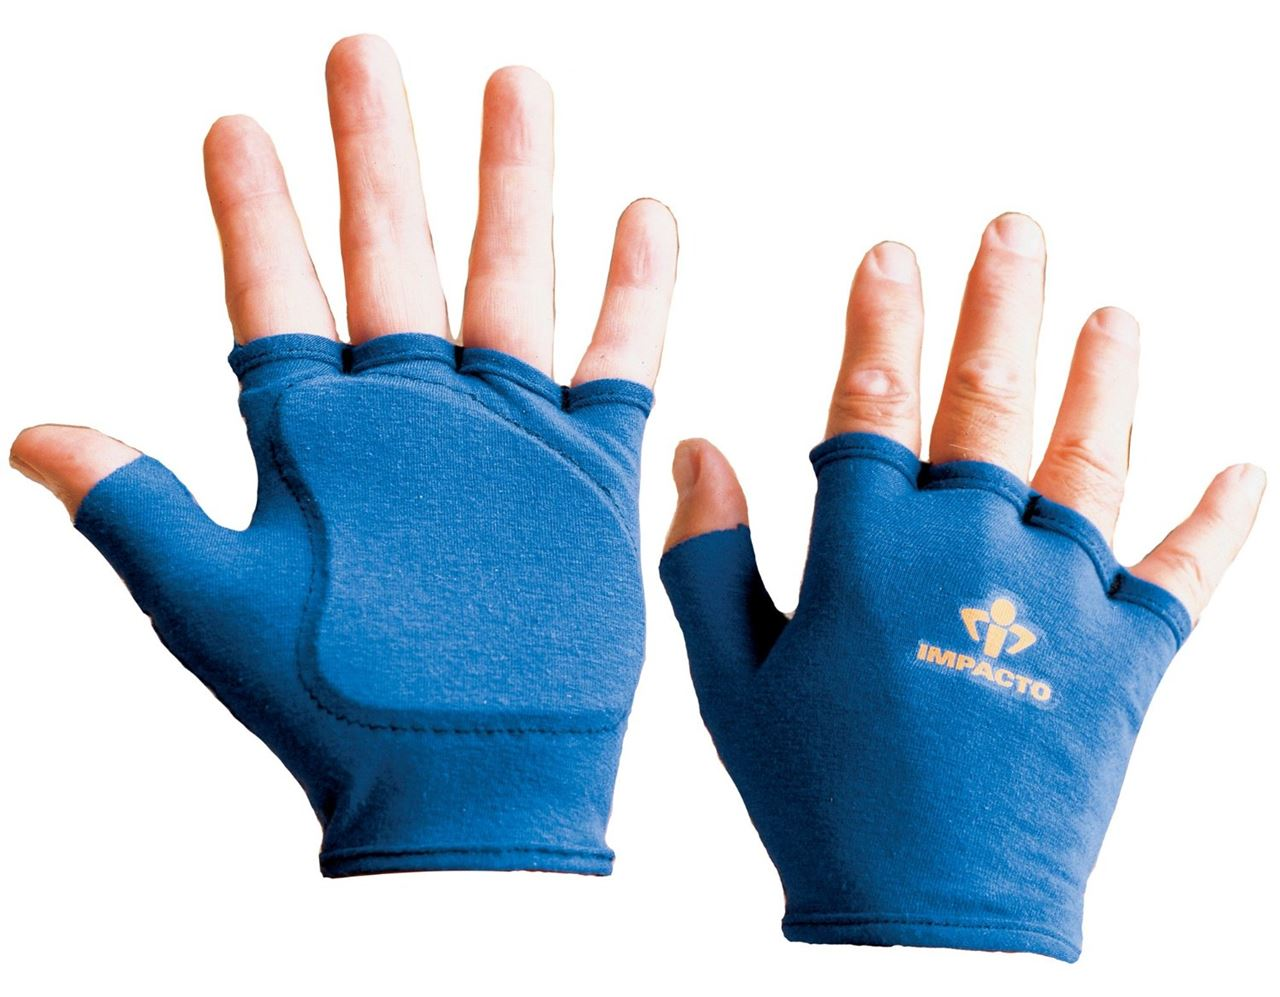 Fingerless impact gloves - Impacto 501 00 Fingerless Work Gloves Anti Vibration High Grip Anti Impact